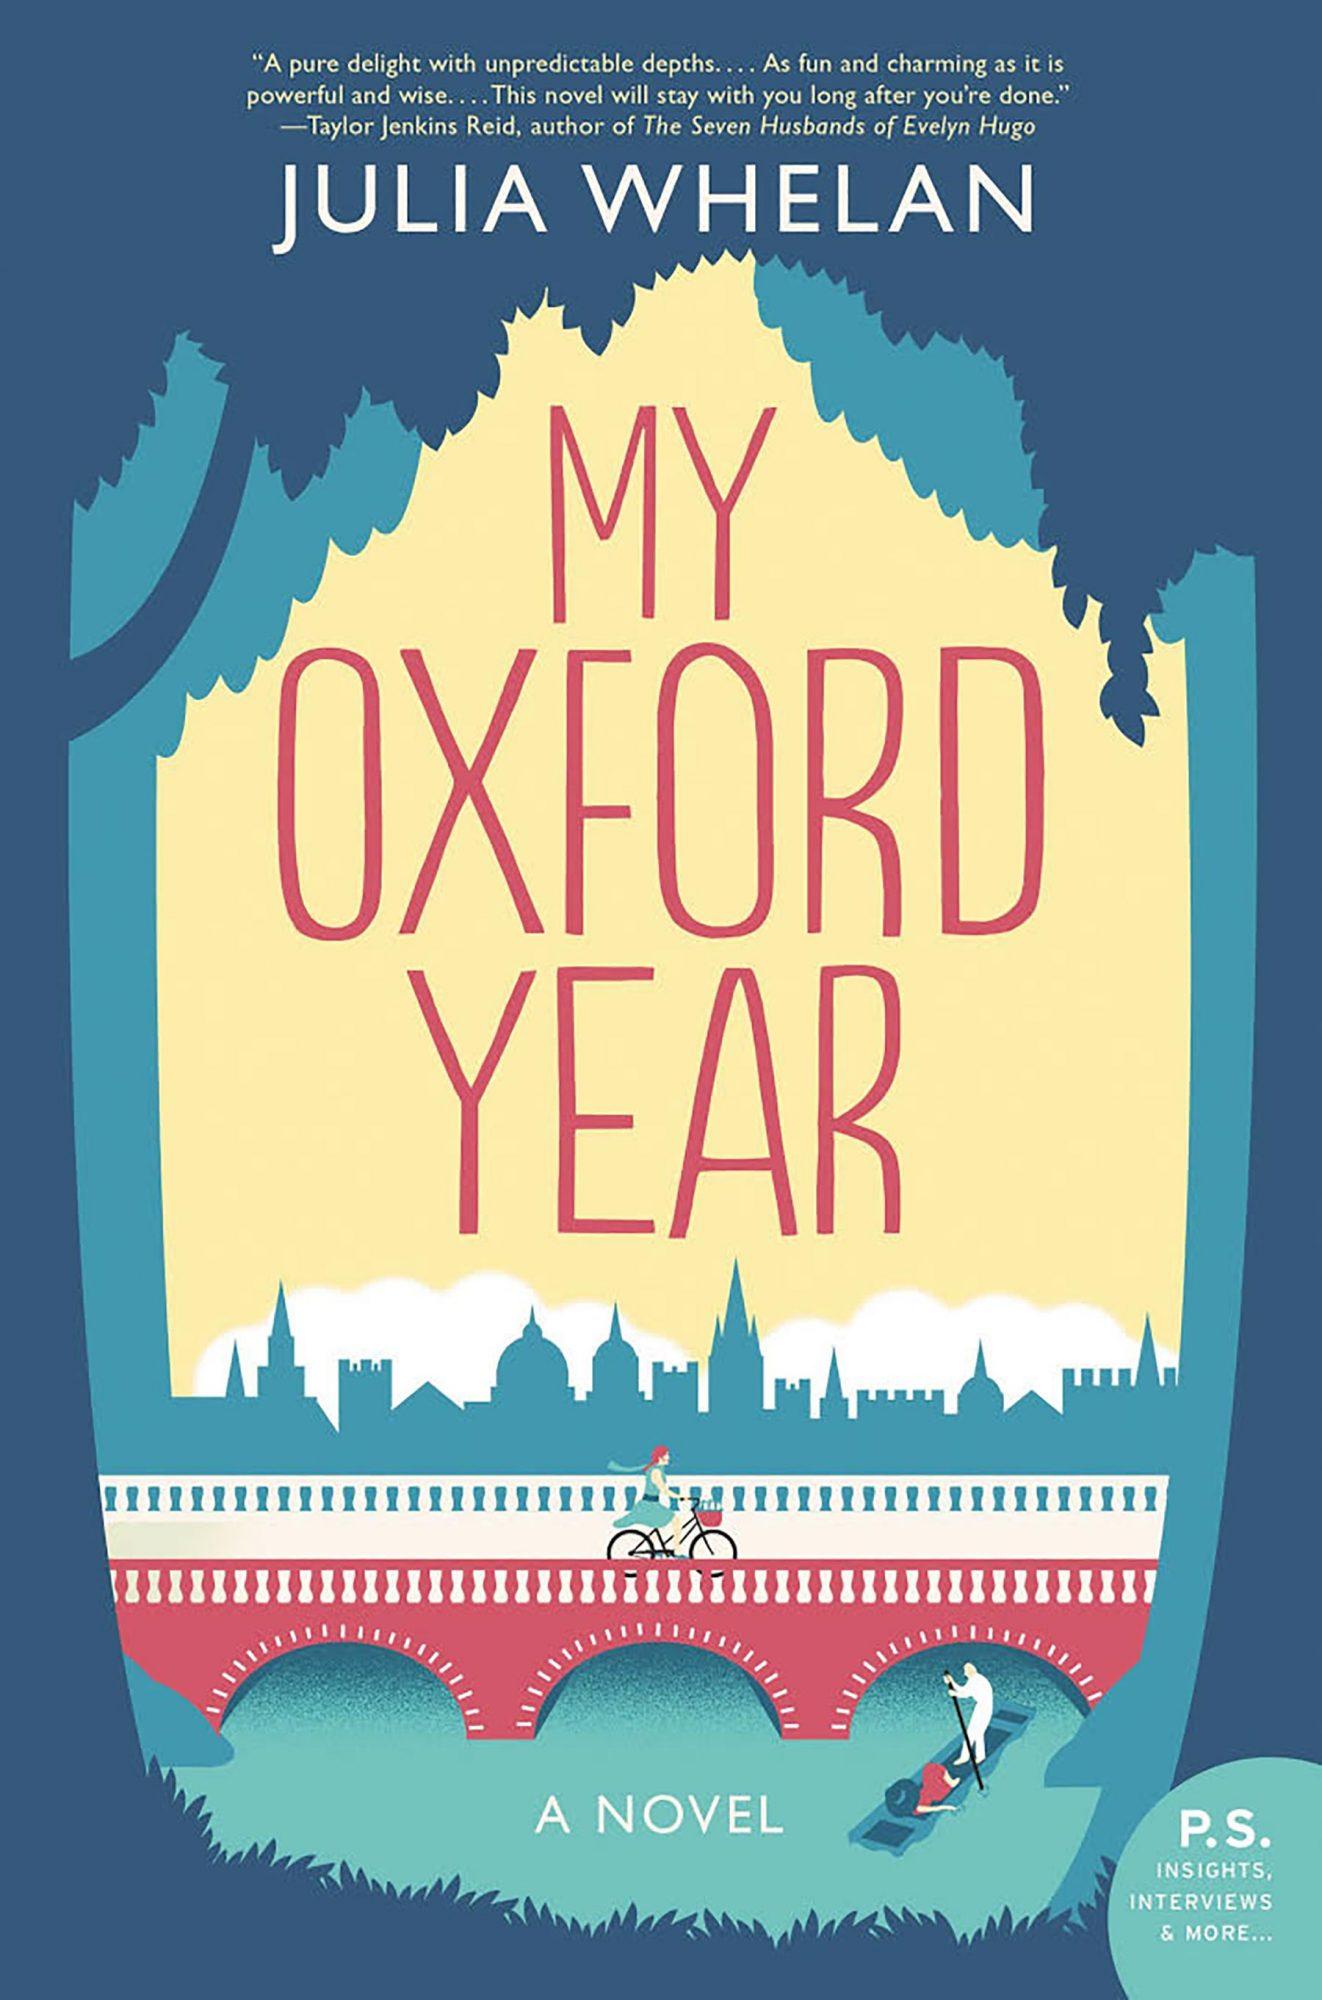 My Oxford Year by Julia Whelan